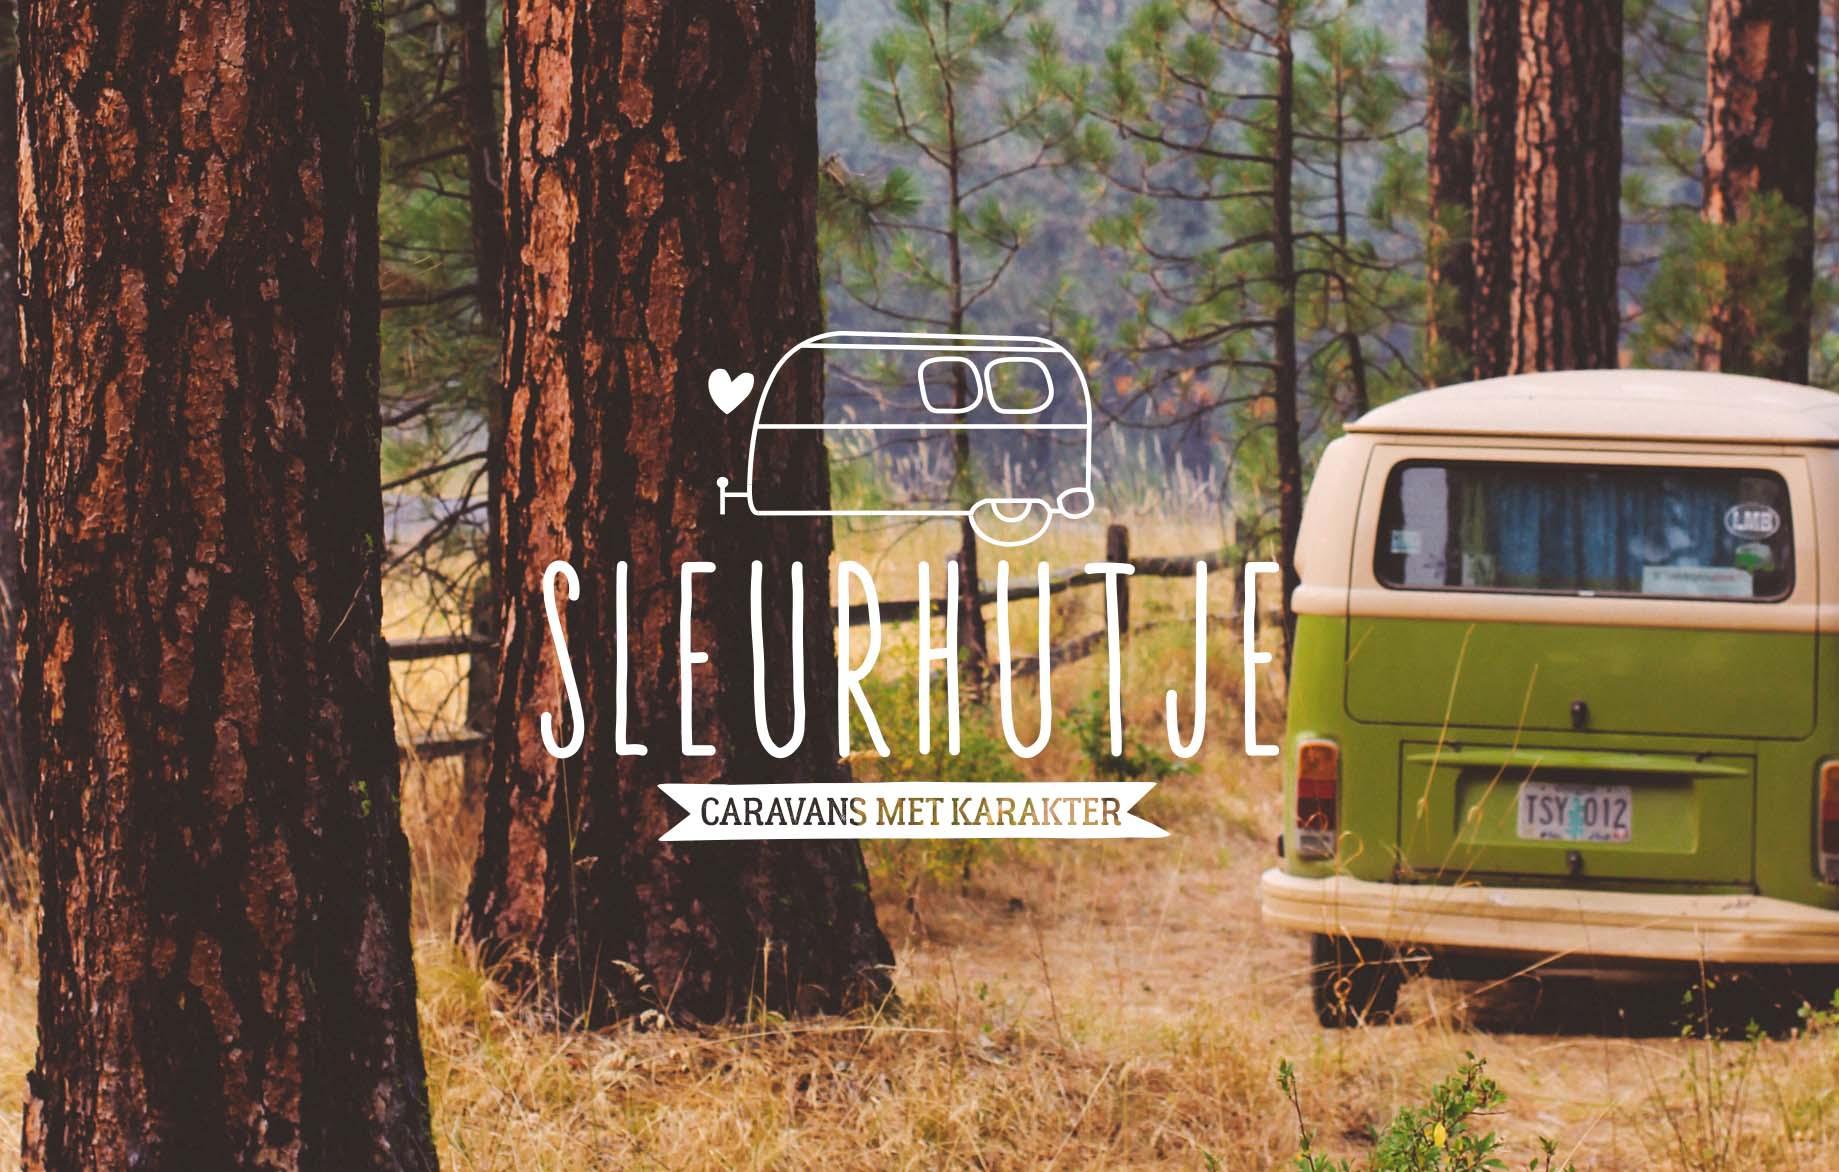 Sleurhutje-logo-ontwerp